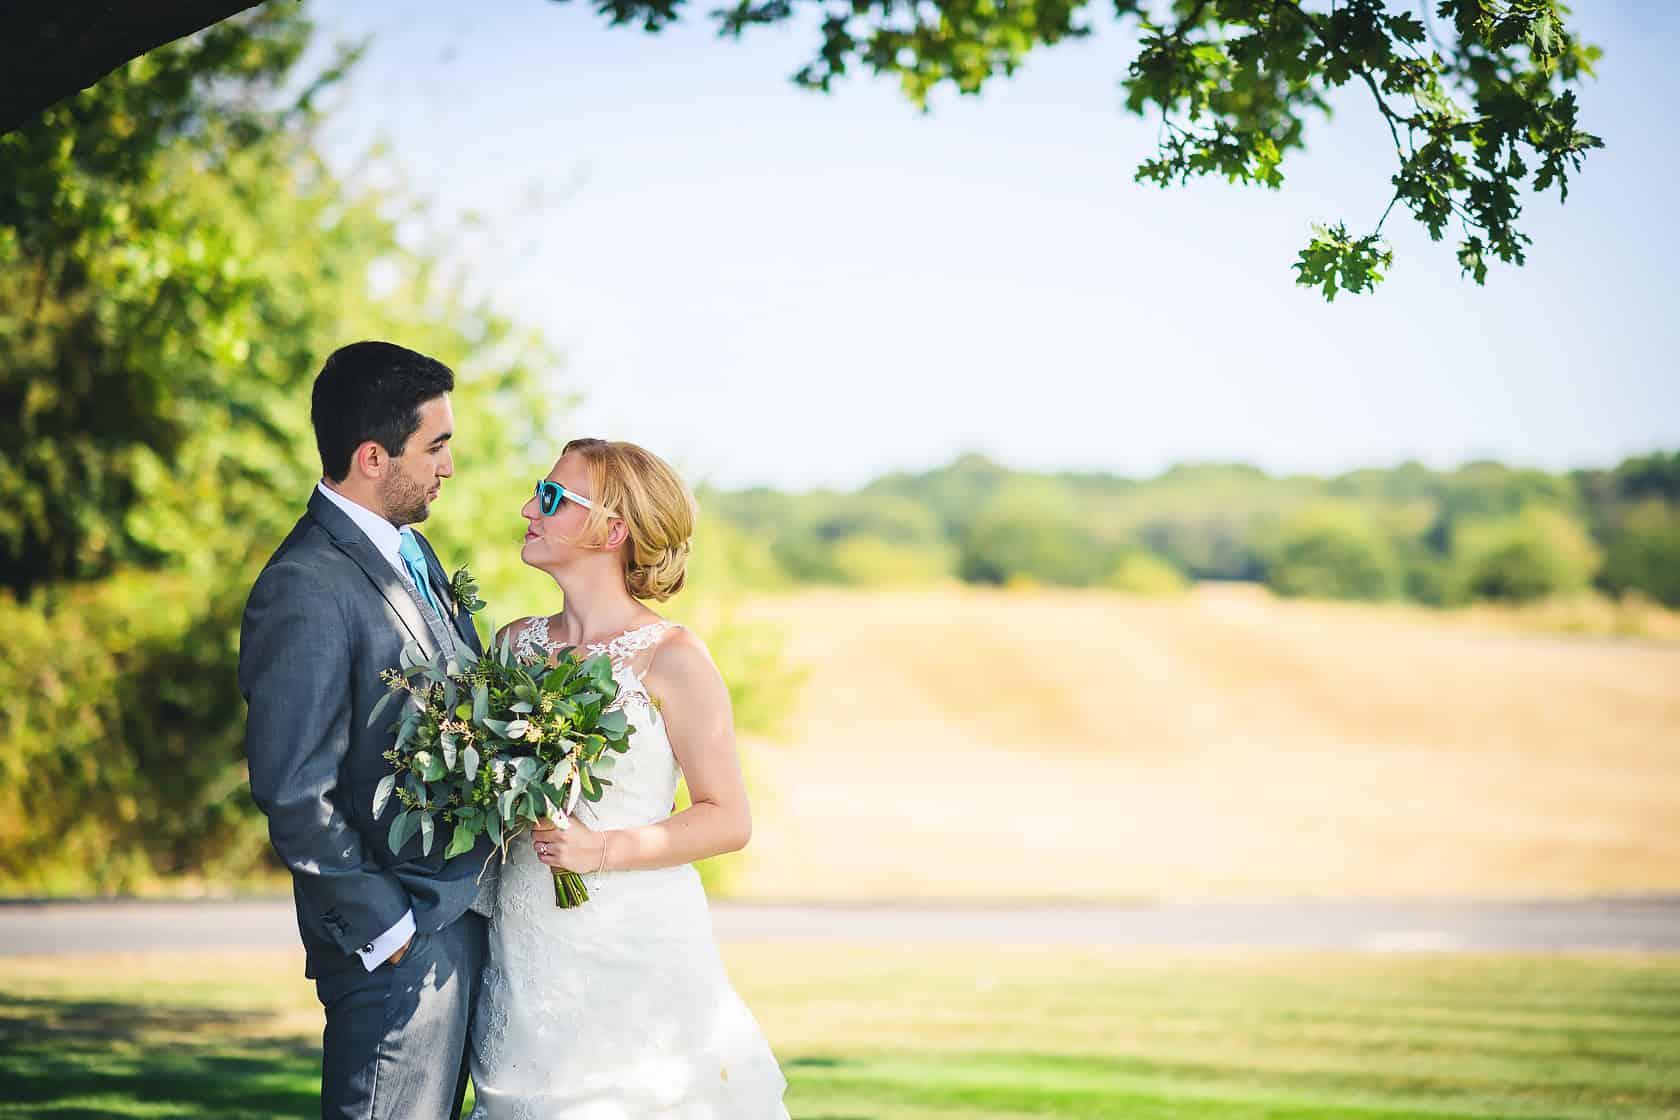 Best_Wedding_Photography_2018_Wedding-Photographer-Essex-and-London_036